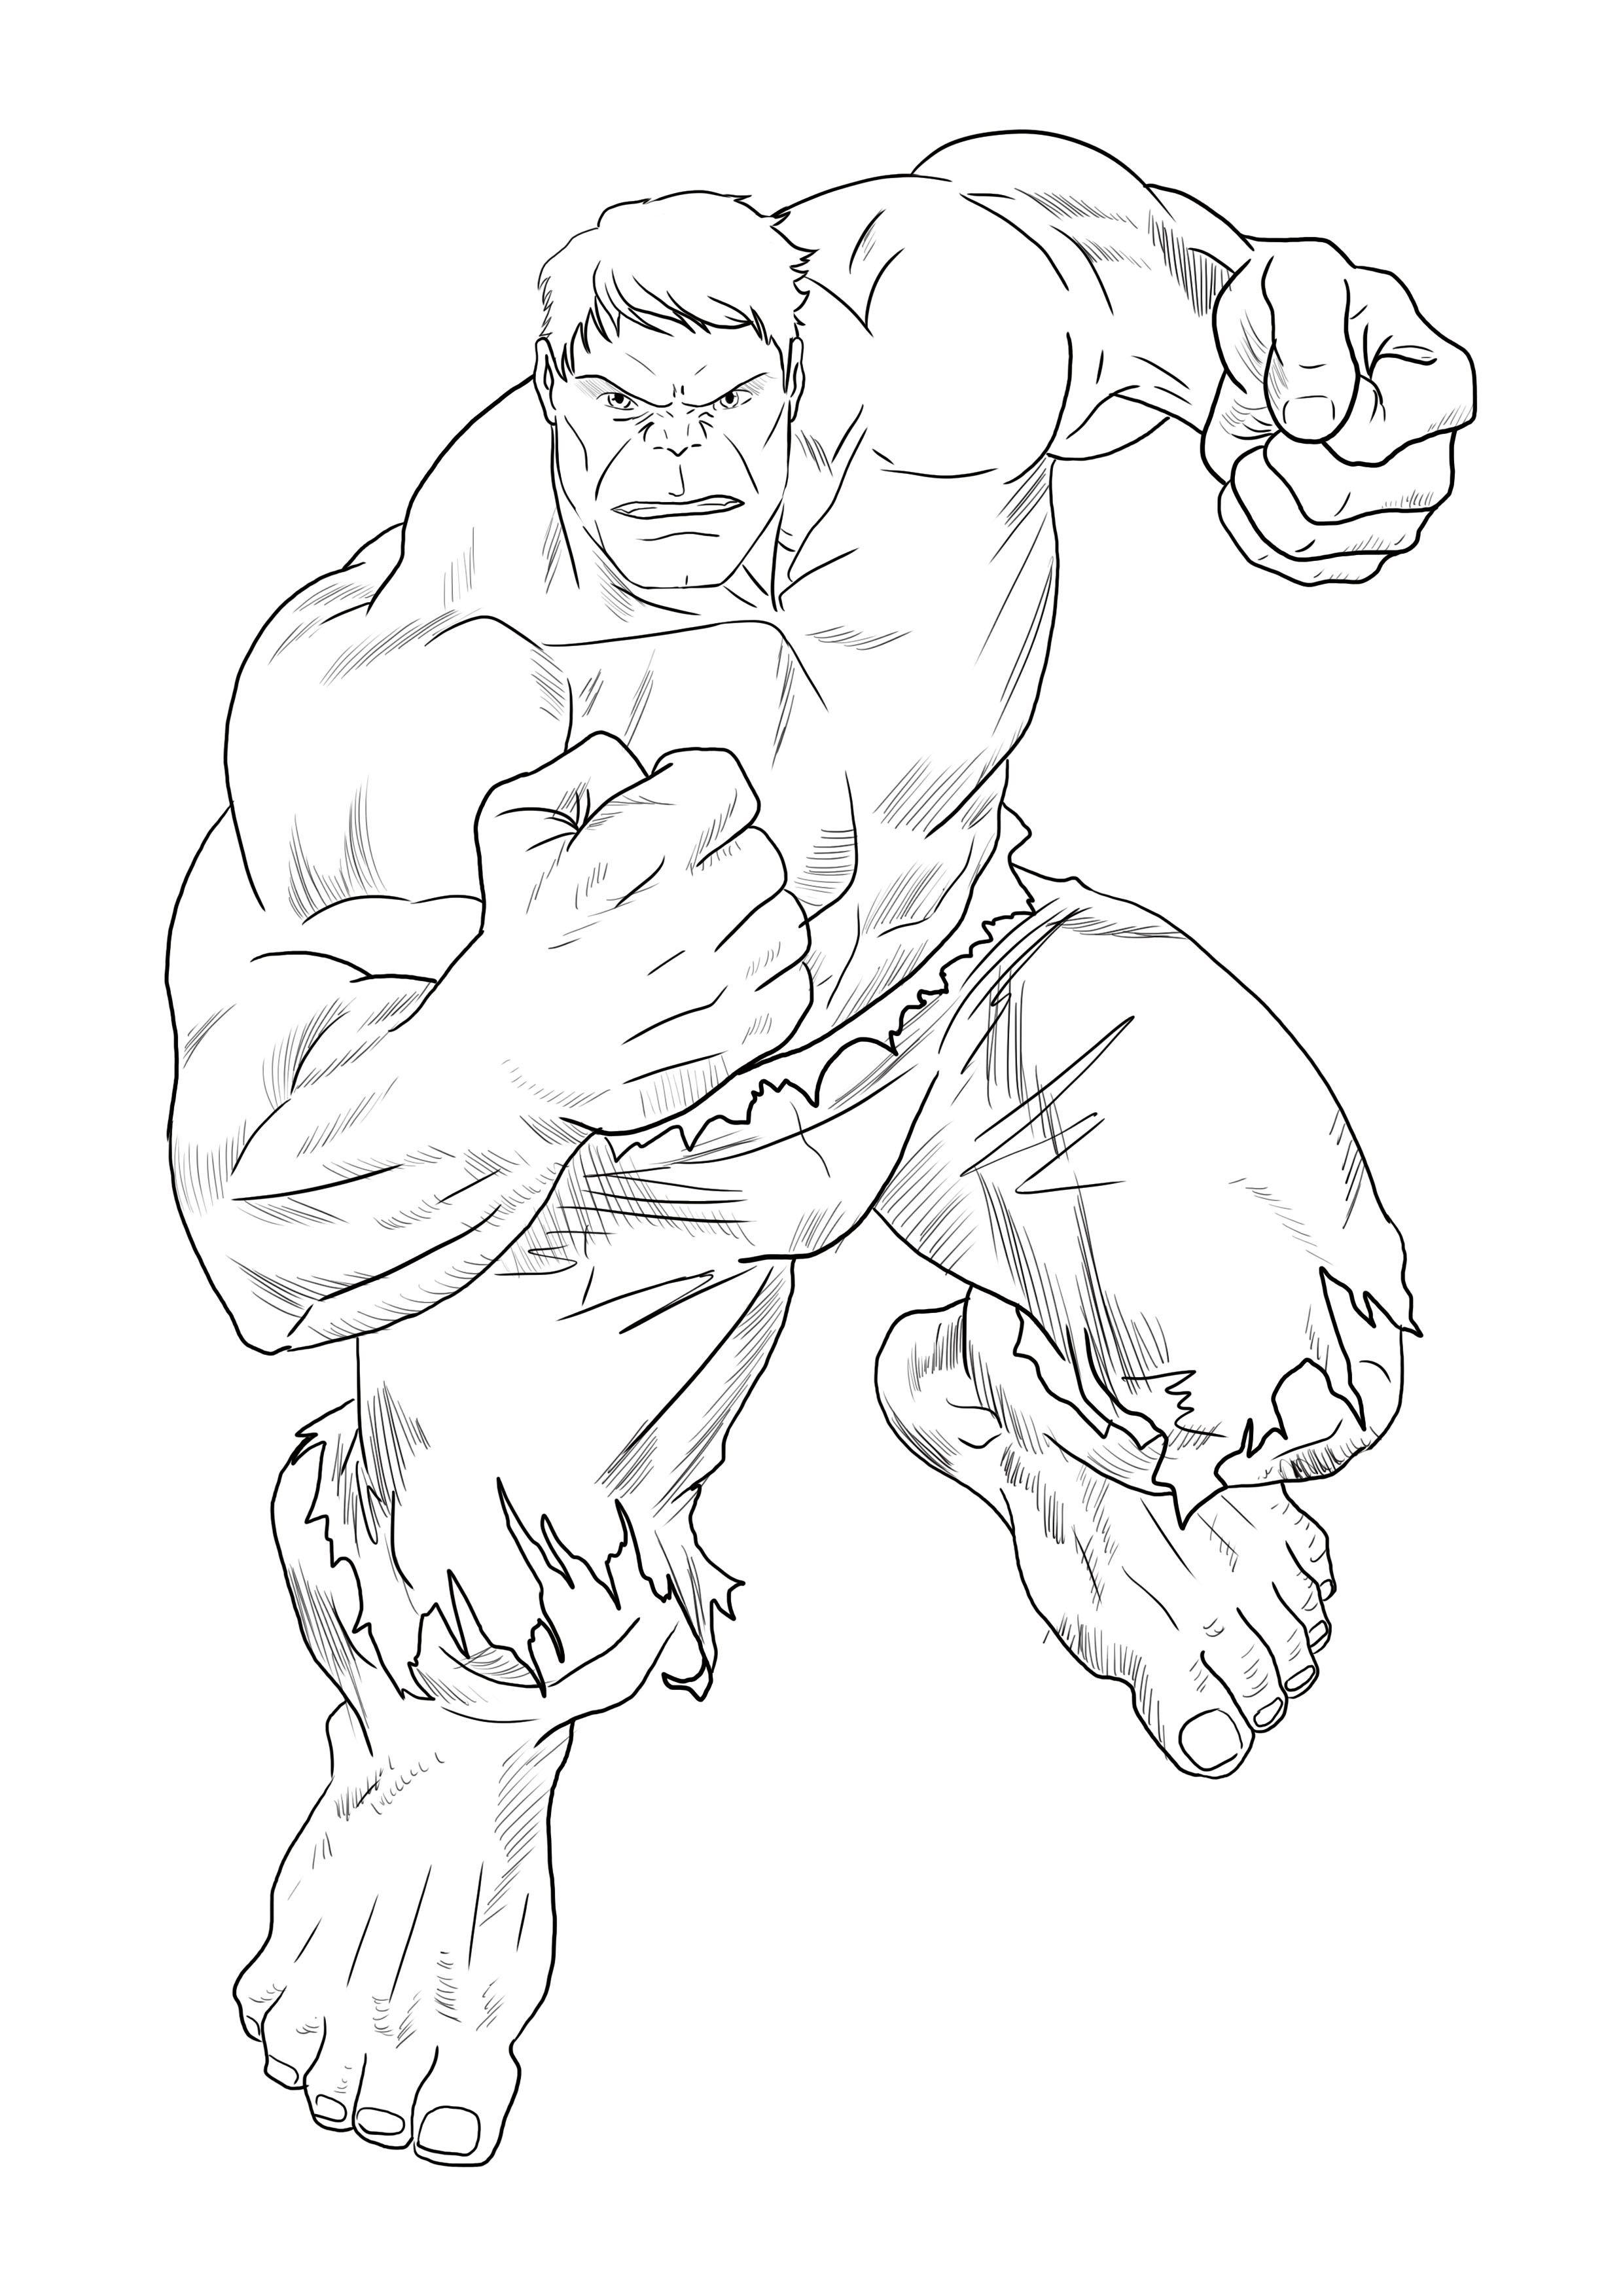 Realiser Un Dessin De Hulk En 2020 Dessin Hulk Dessin Dessin Super Hero